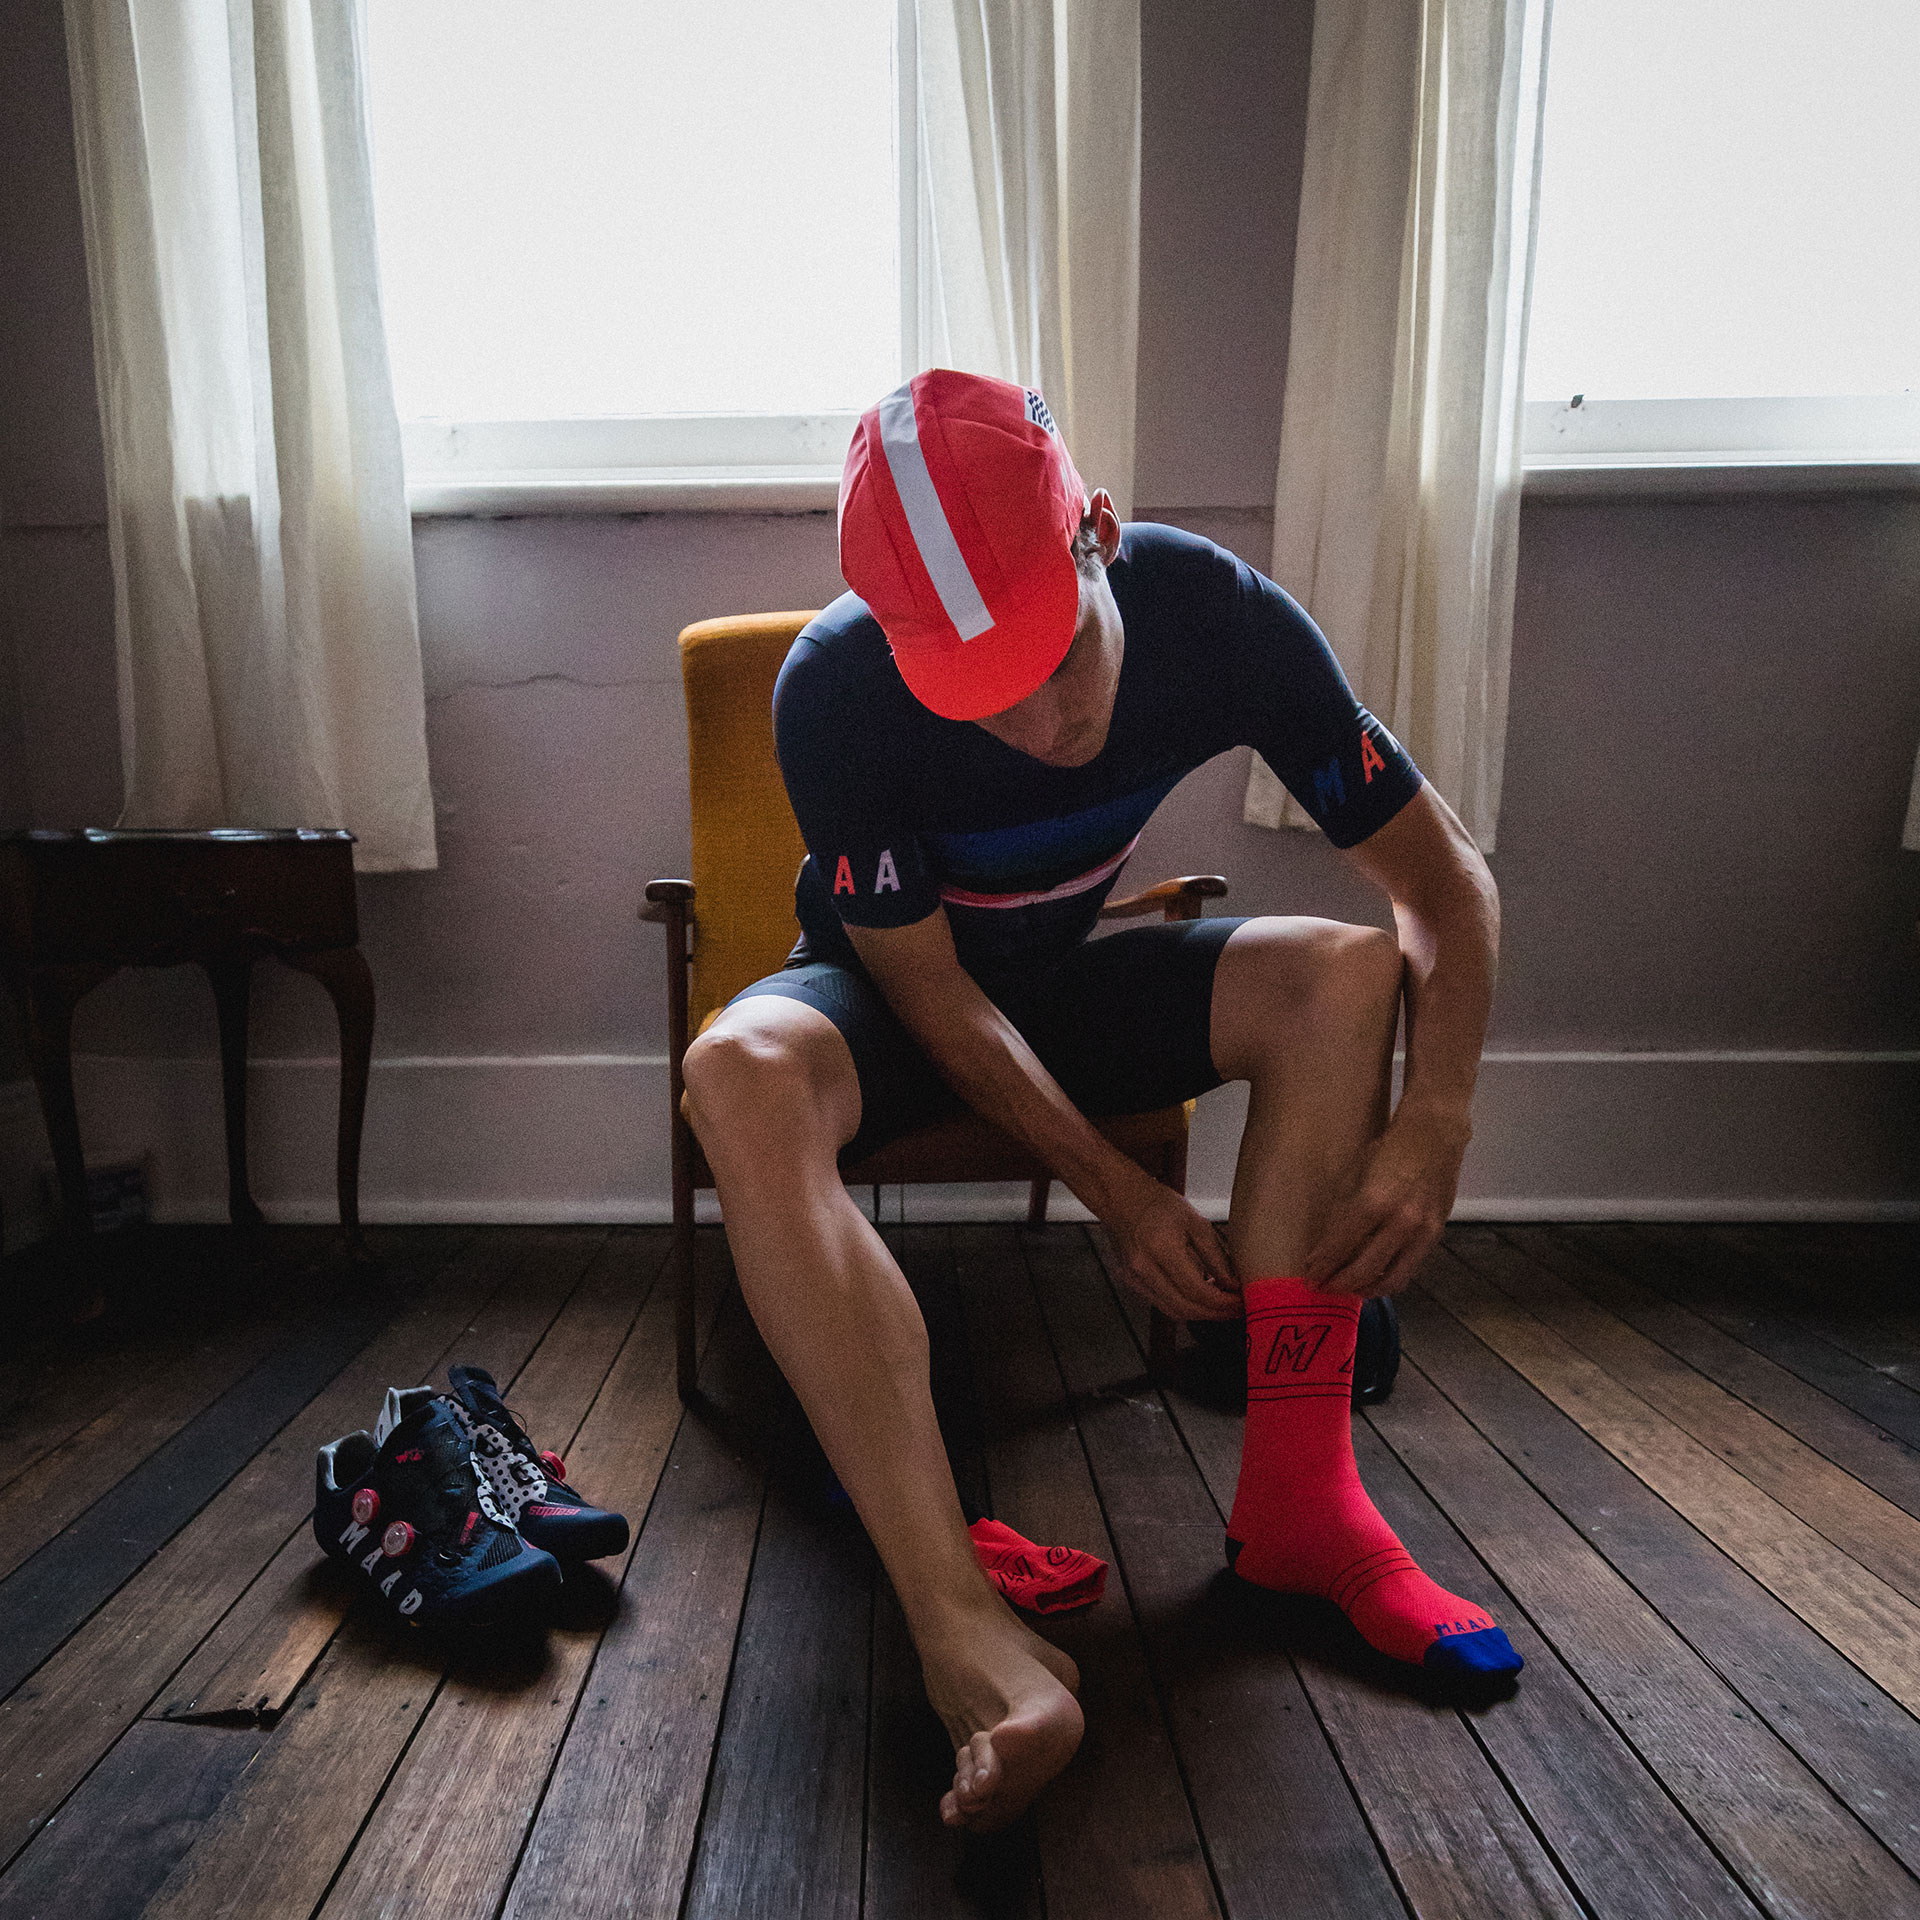 MAAP Cyclist Pulling Socks On